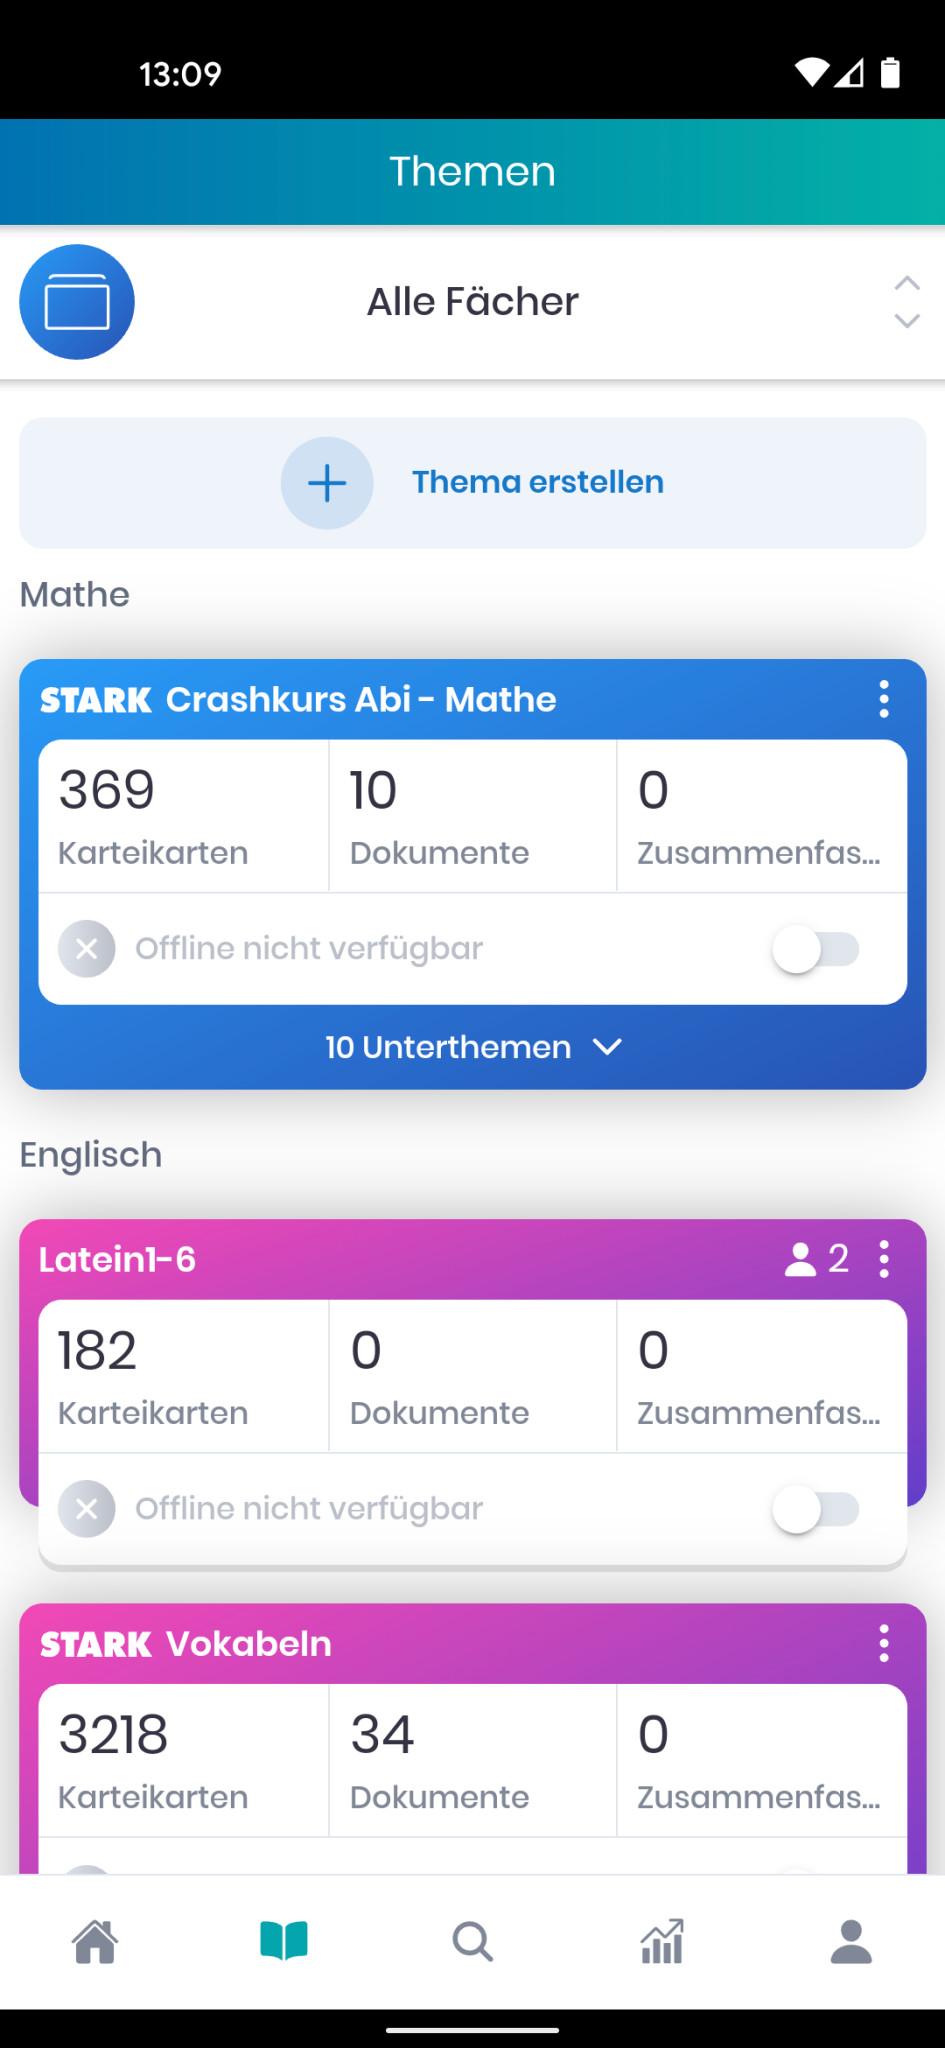 Screenshot 1 - StudySmarter Lernapp für Studium & Schule (Android-App)